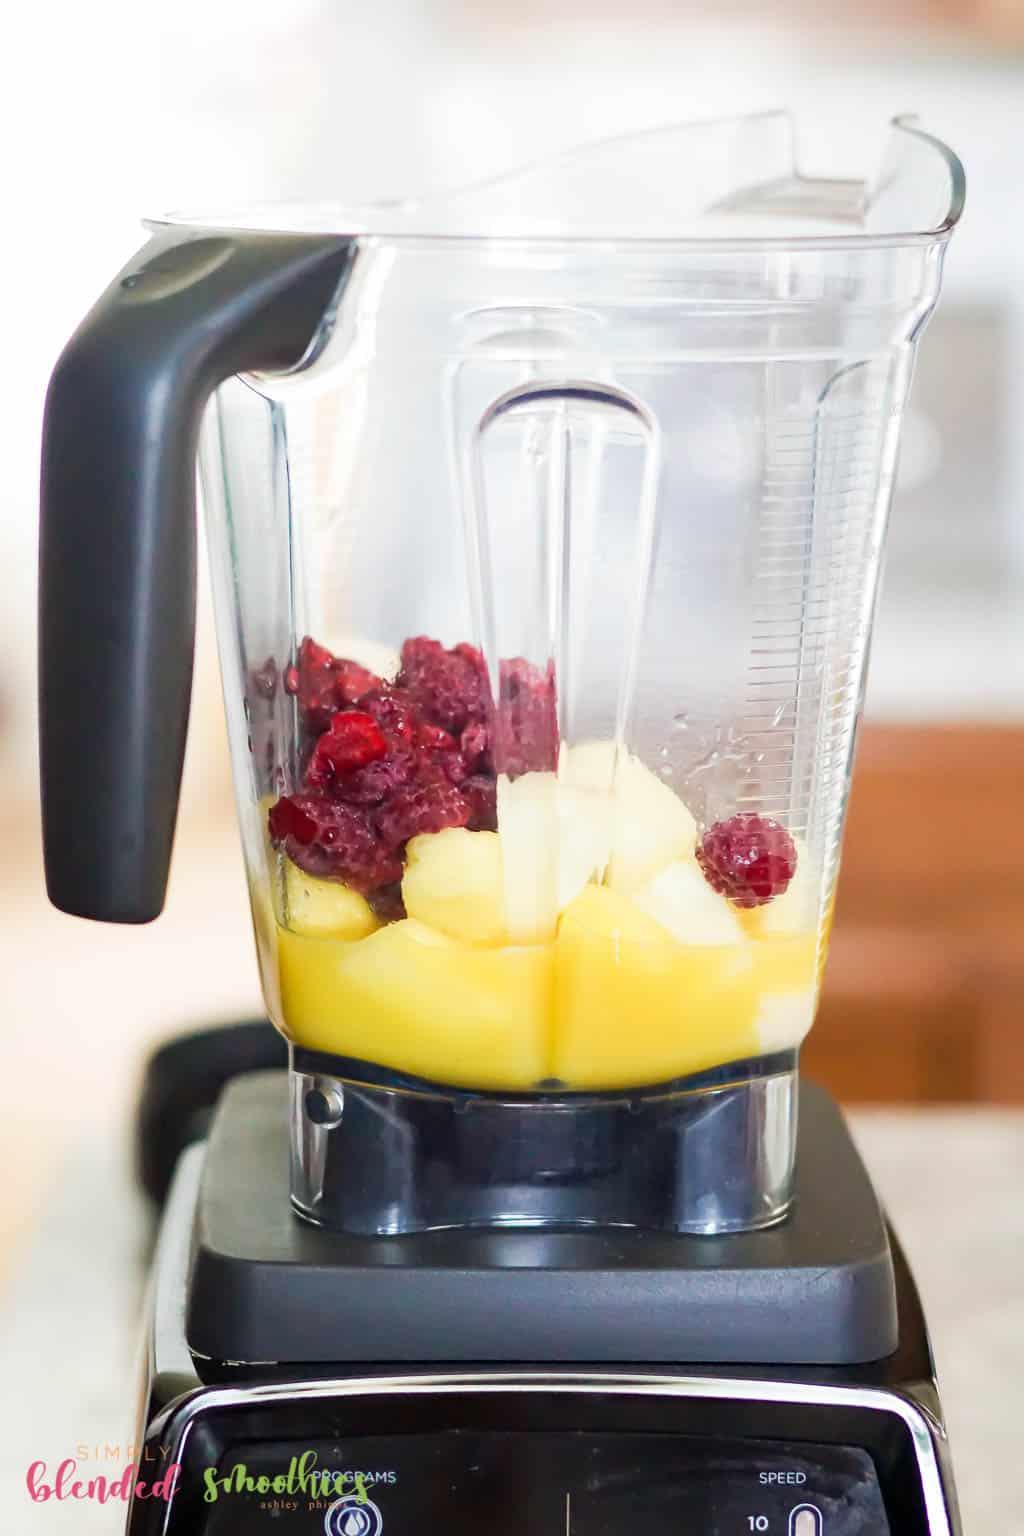 Pineapple Raspberry Smoothie ingredients in a blender